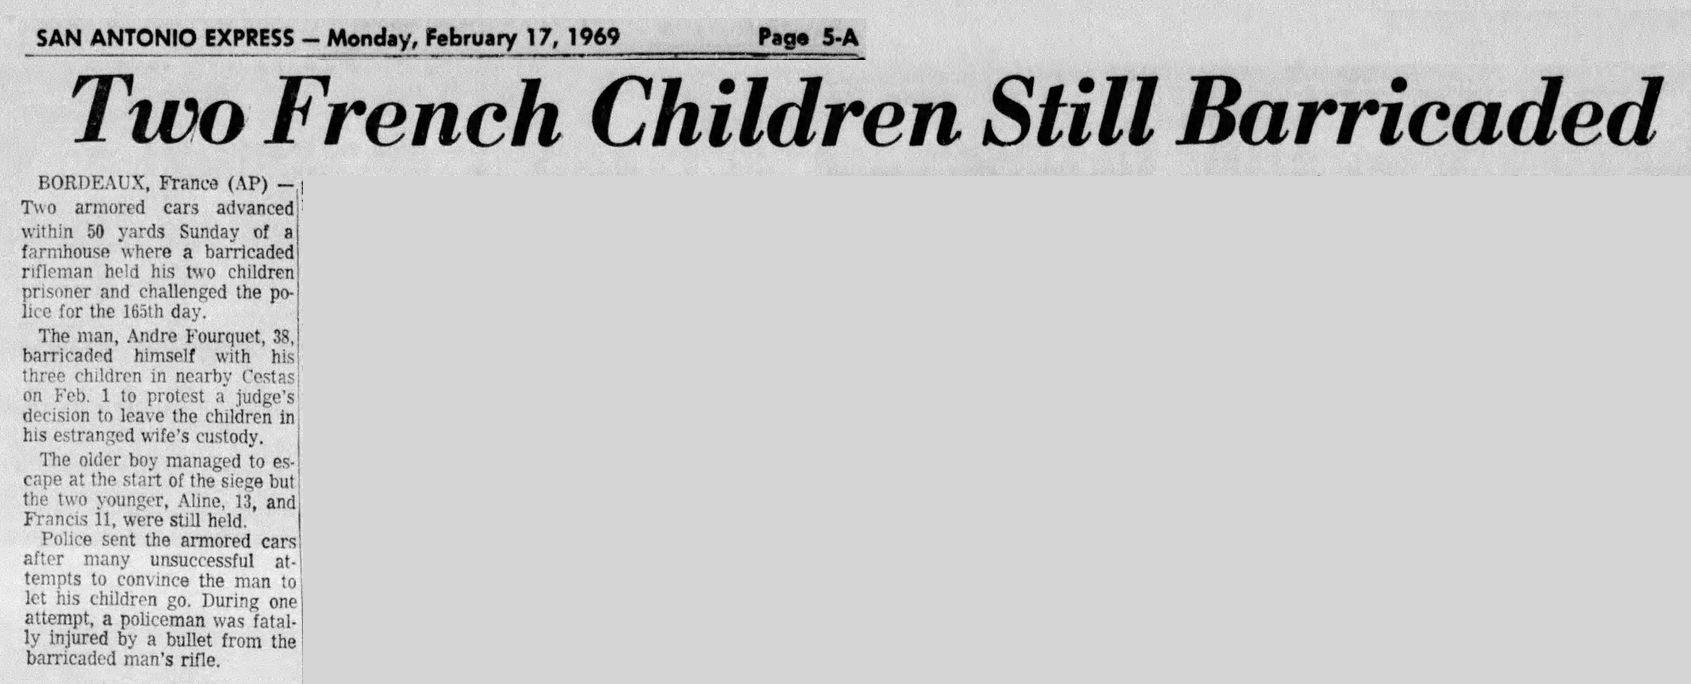 San Antonio Express, nº 106, 17 février 1969, p. 5-A